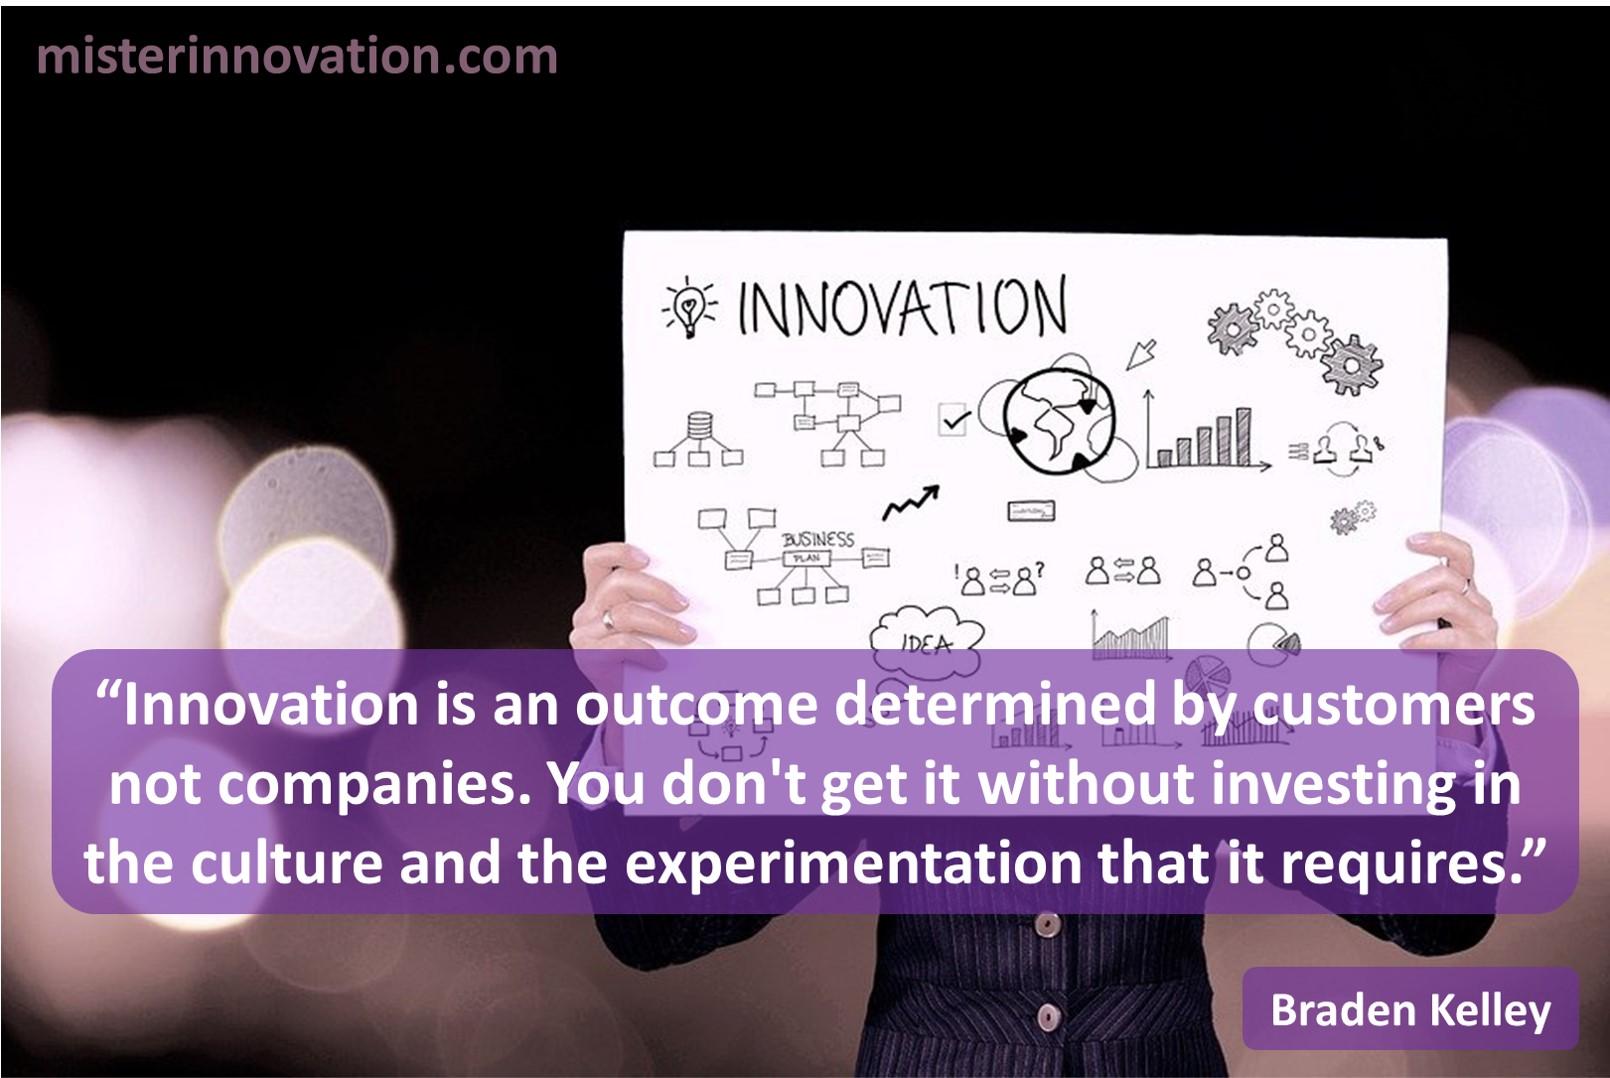 Innovation Customer Outcome